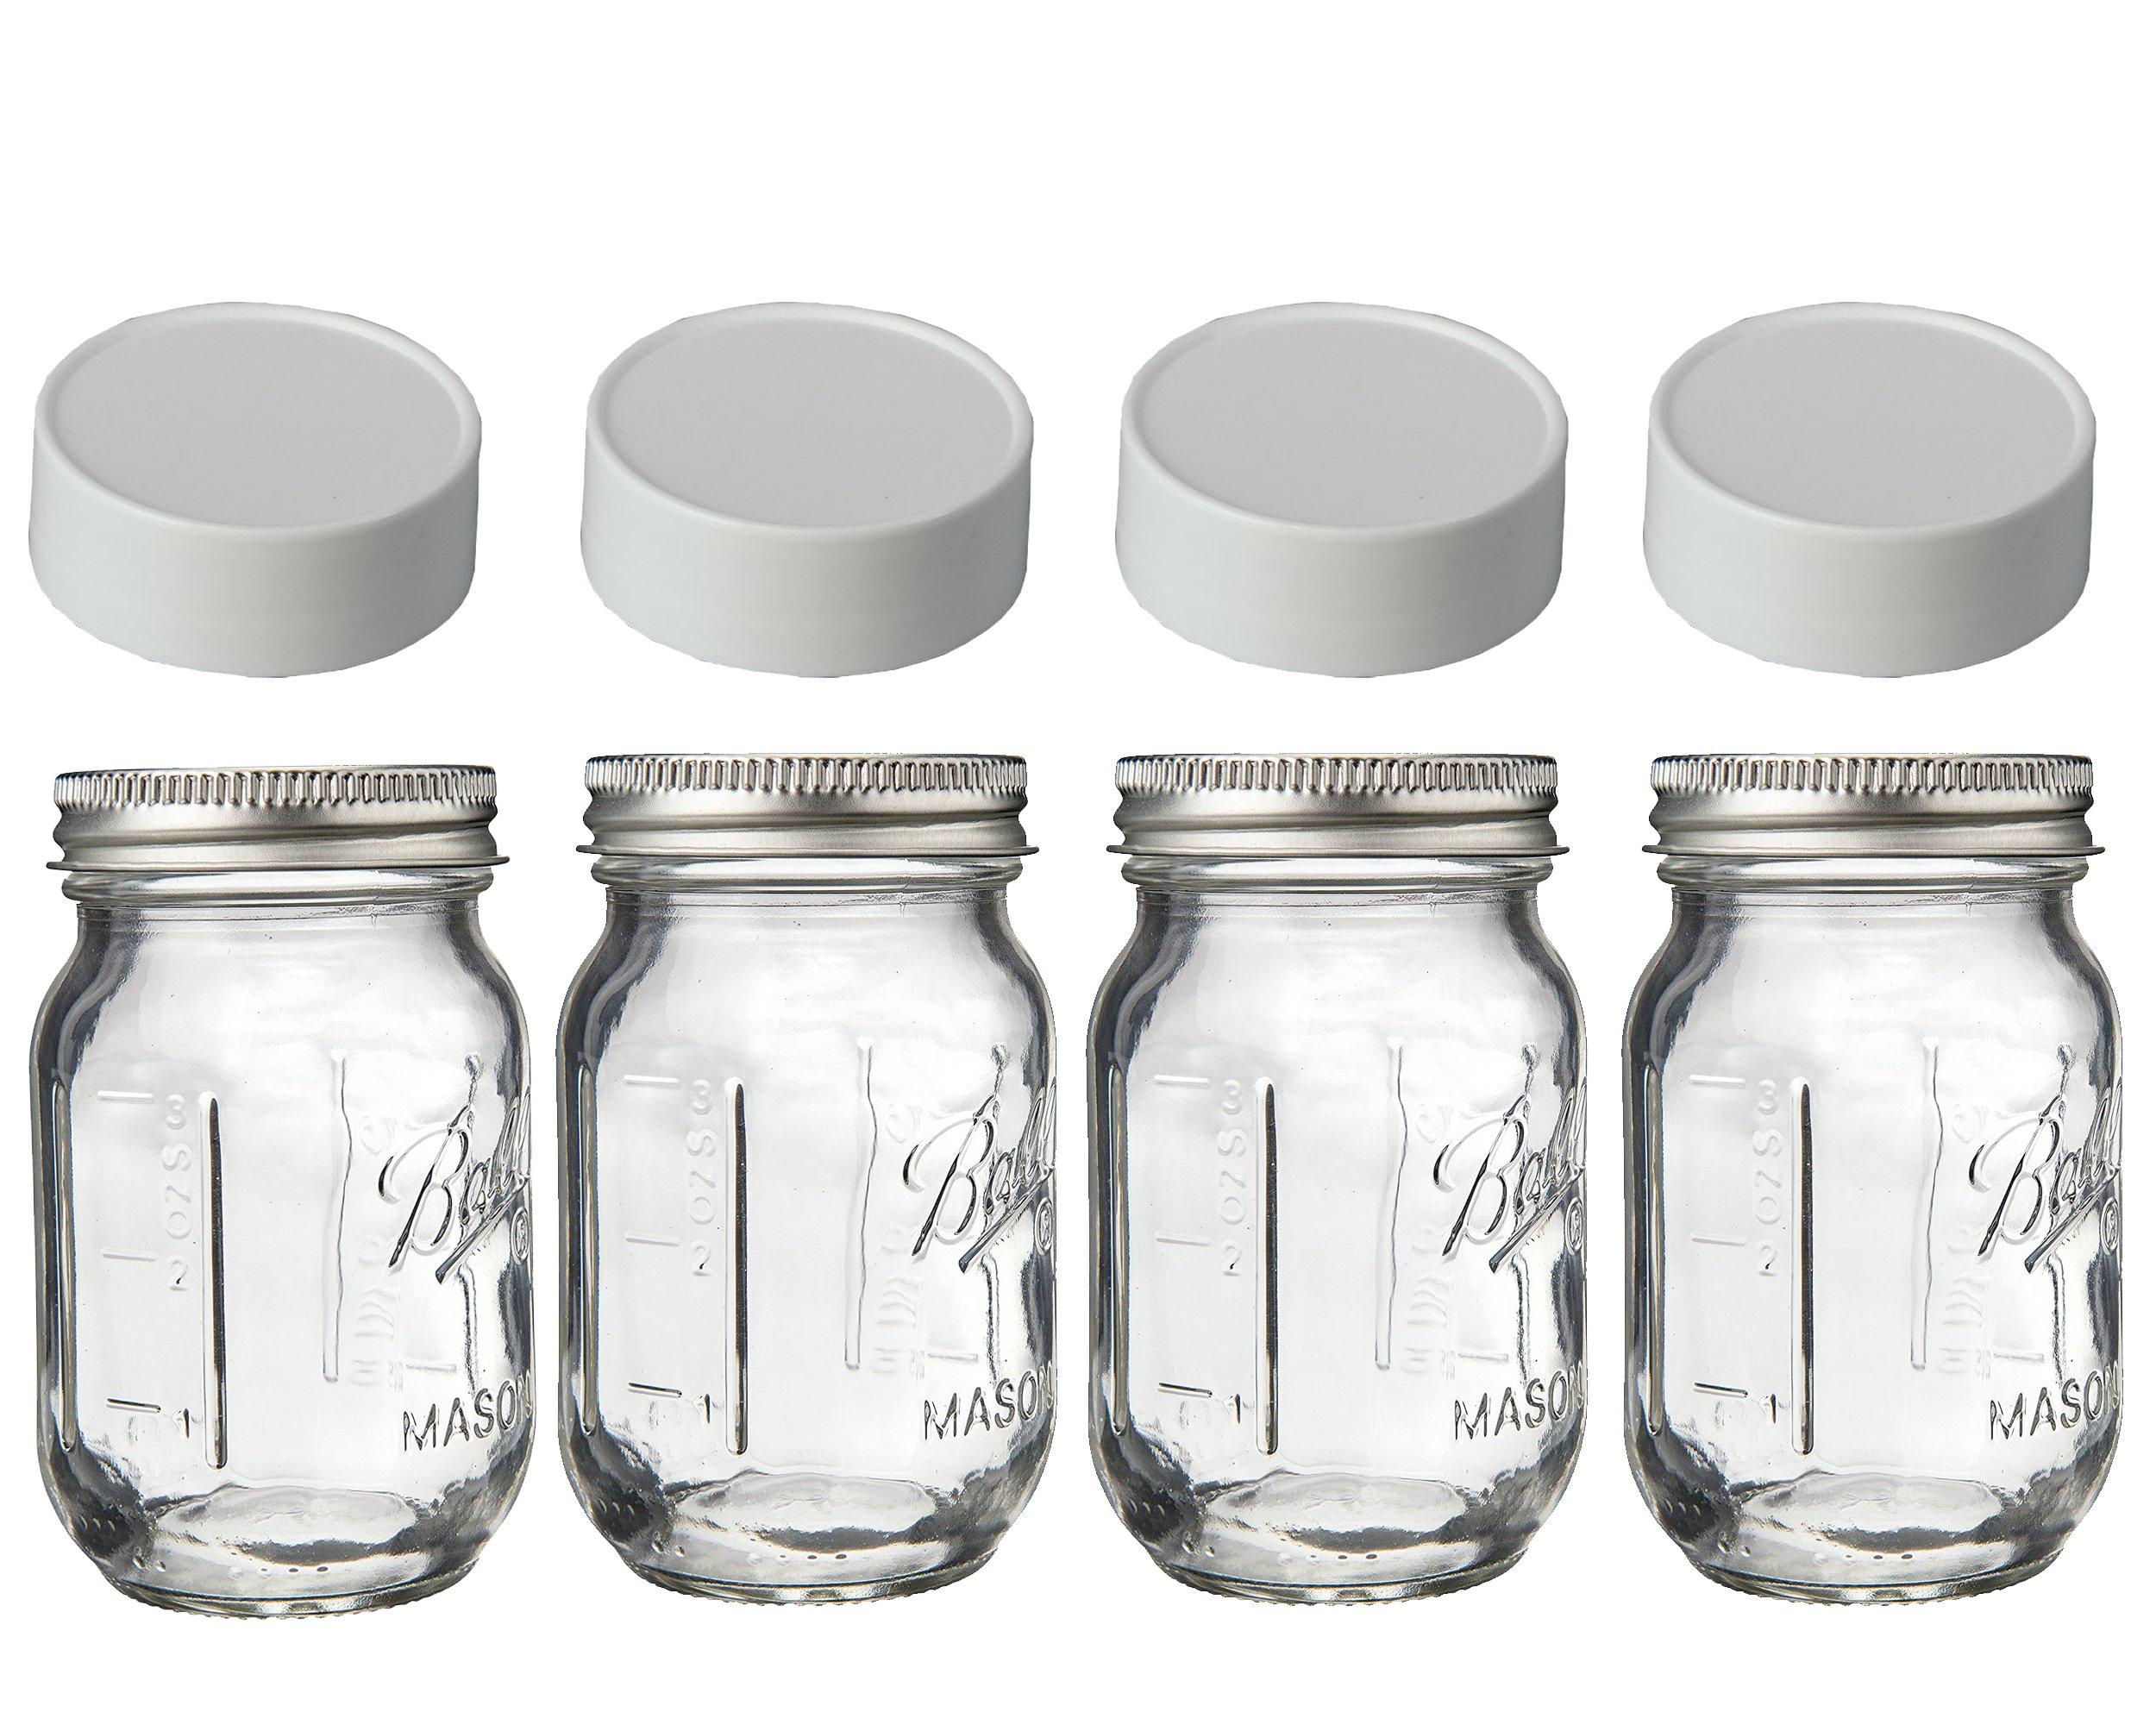 Mini Mason Spice Jars with Plastic Storage Lid 4oz (white)